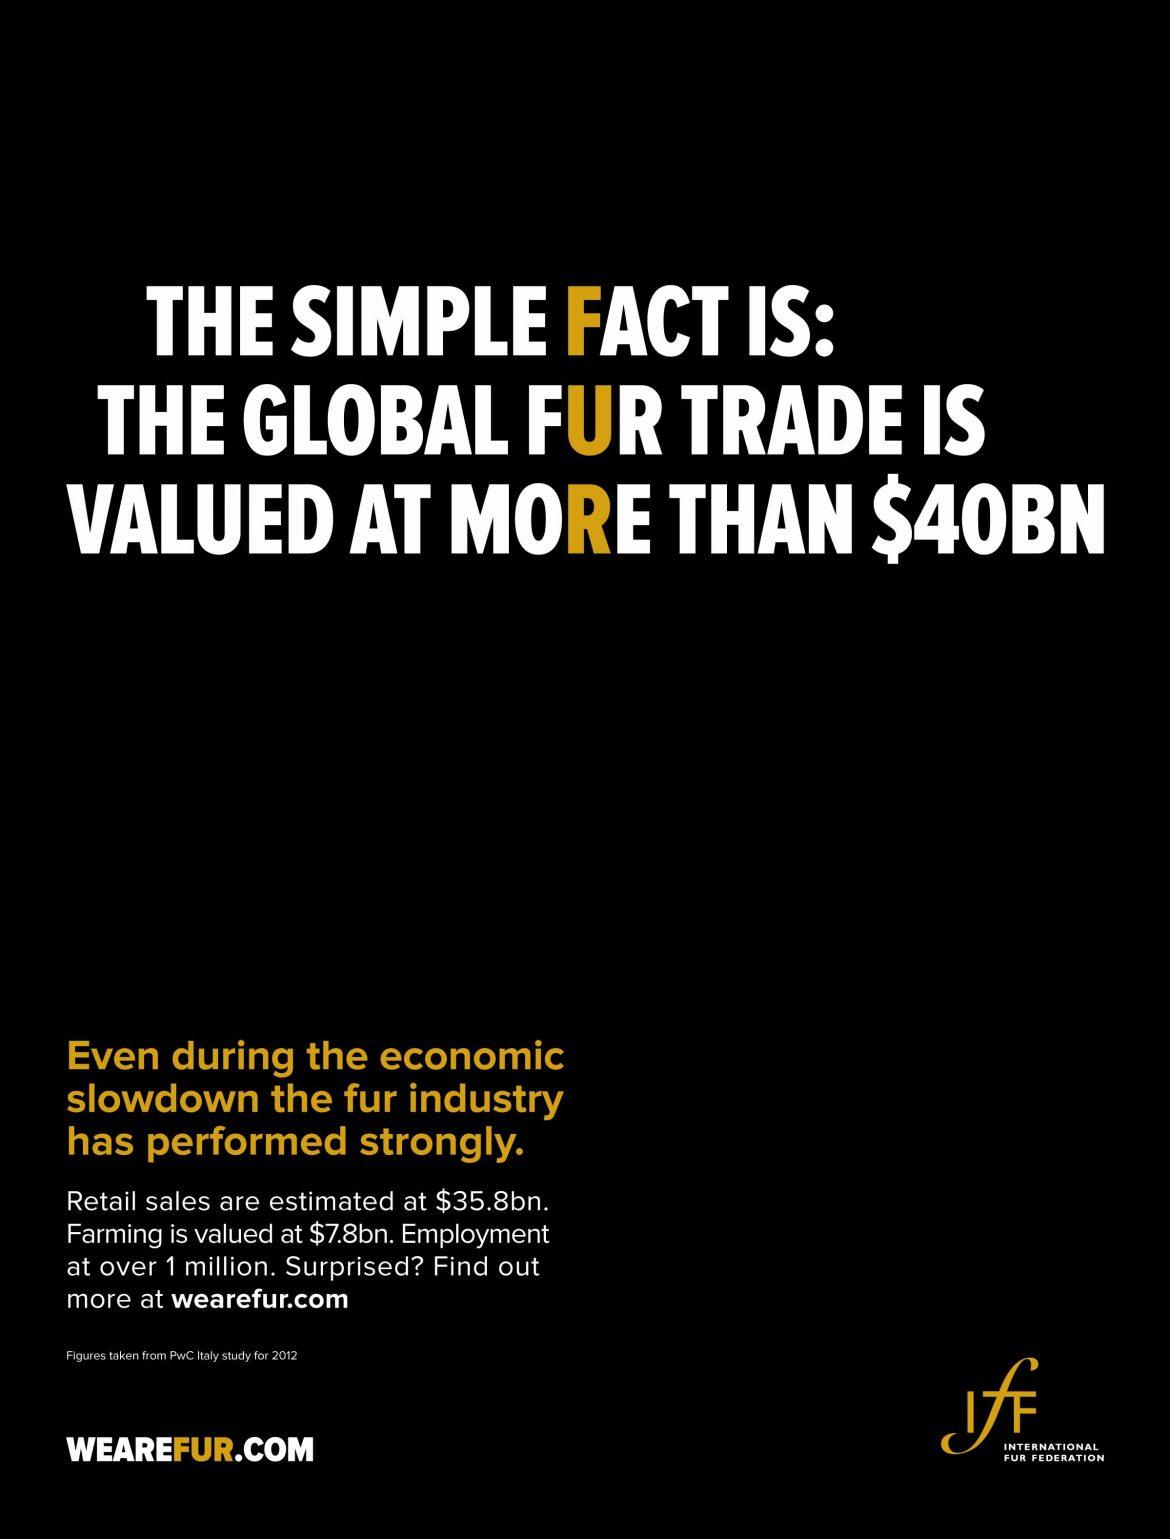 internationalfurfederation_theeconomist_wearefur